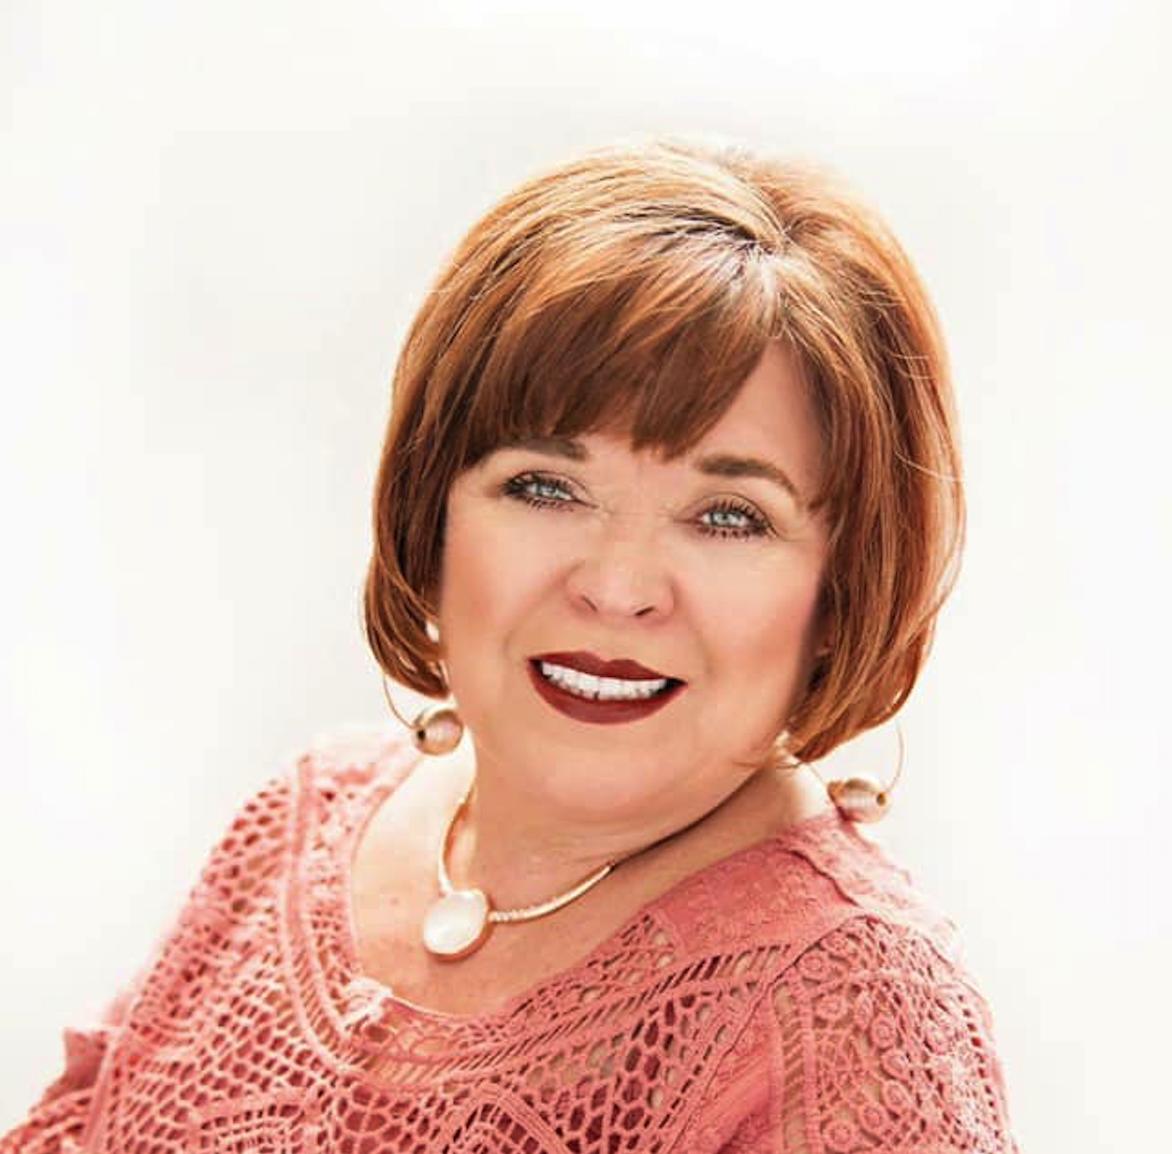 Evangelist Hollmer fulfilled her prophecy